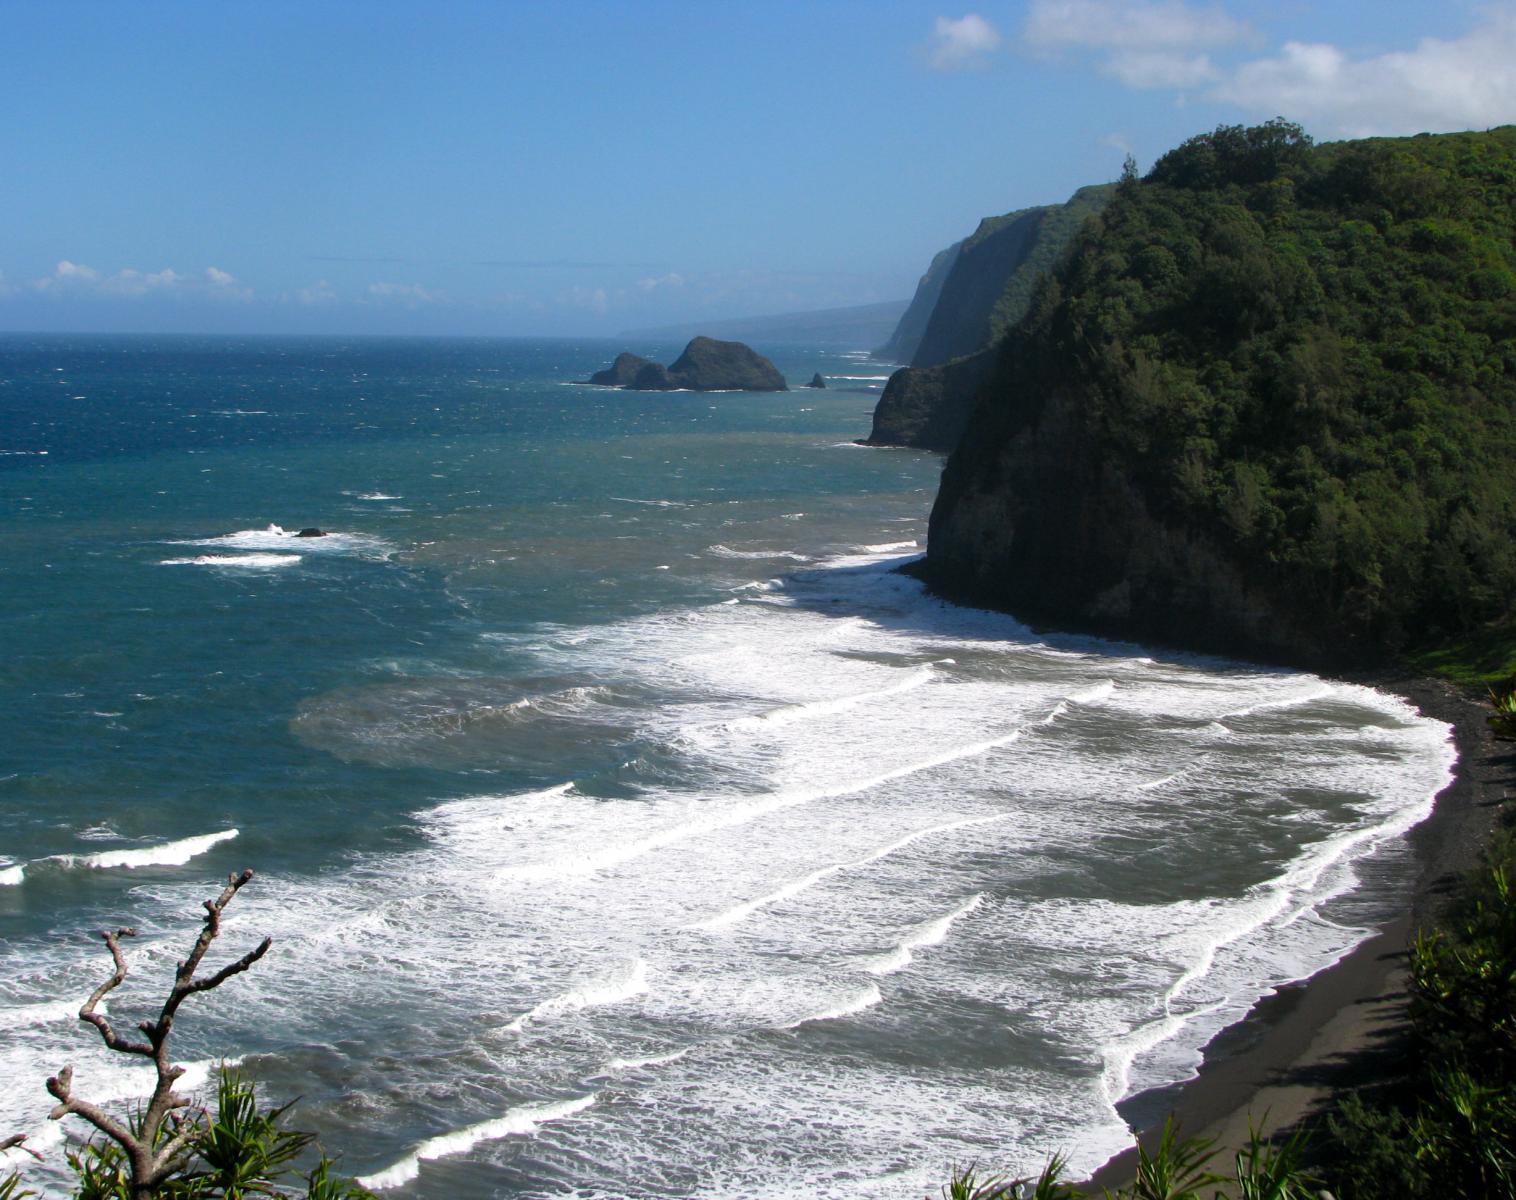 États-Unis  HAWAII, MONTAGNES DE FEU (en liberté)   Découverte & Balade Trek & Randonnée Balade nature